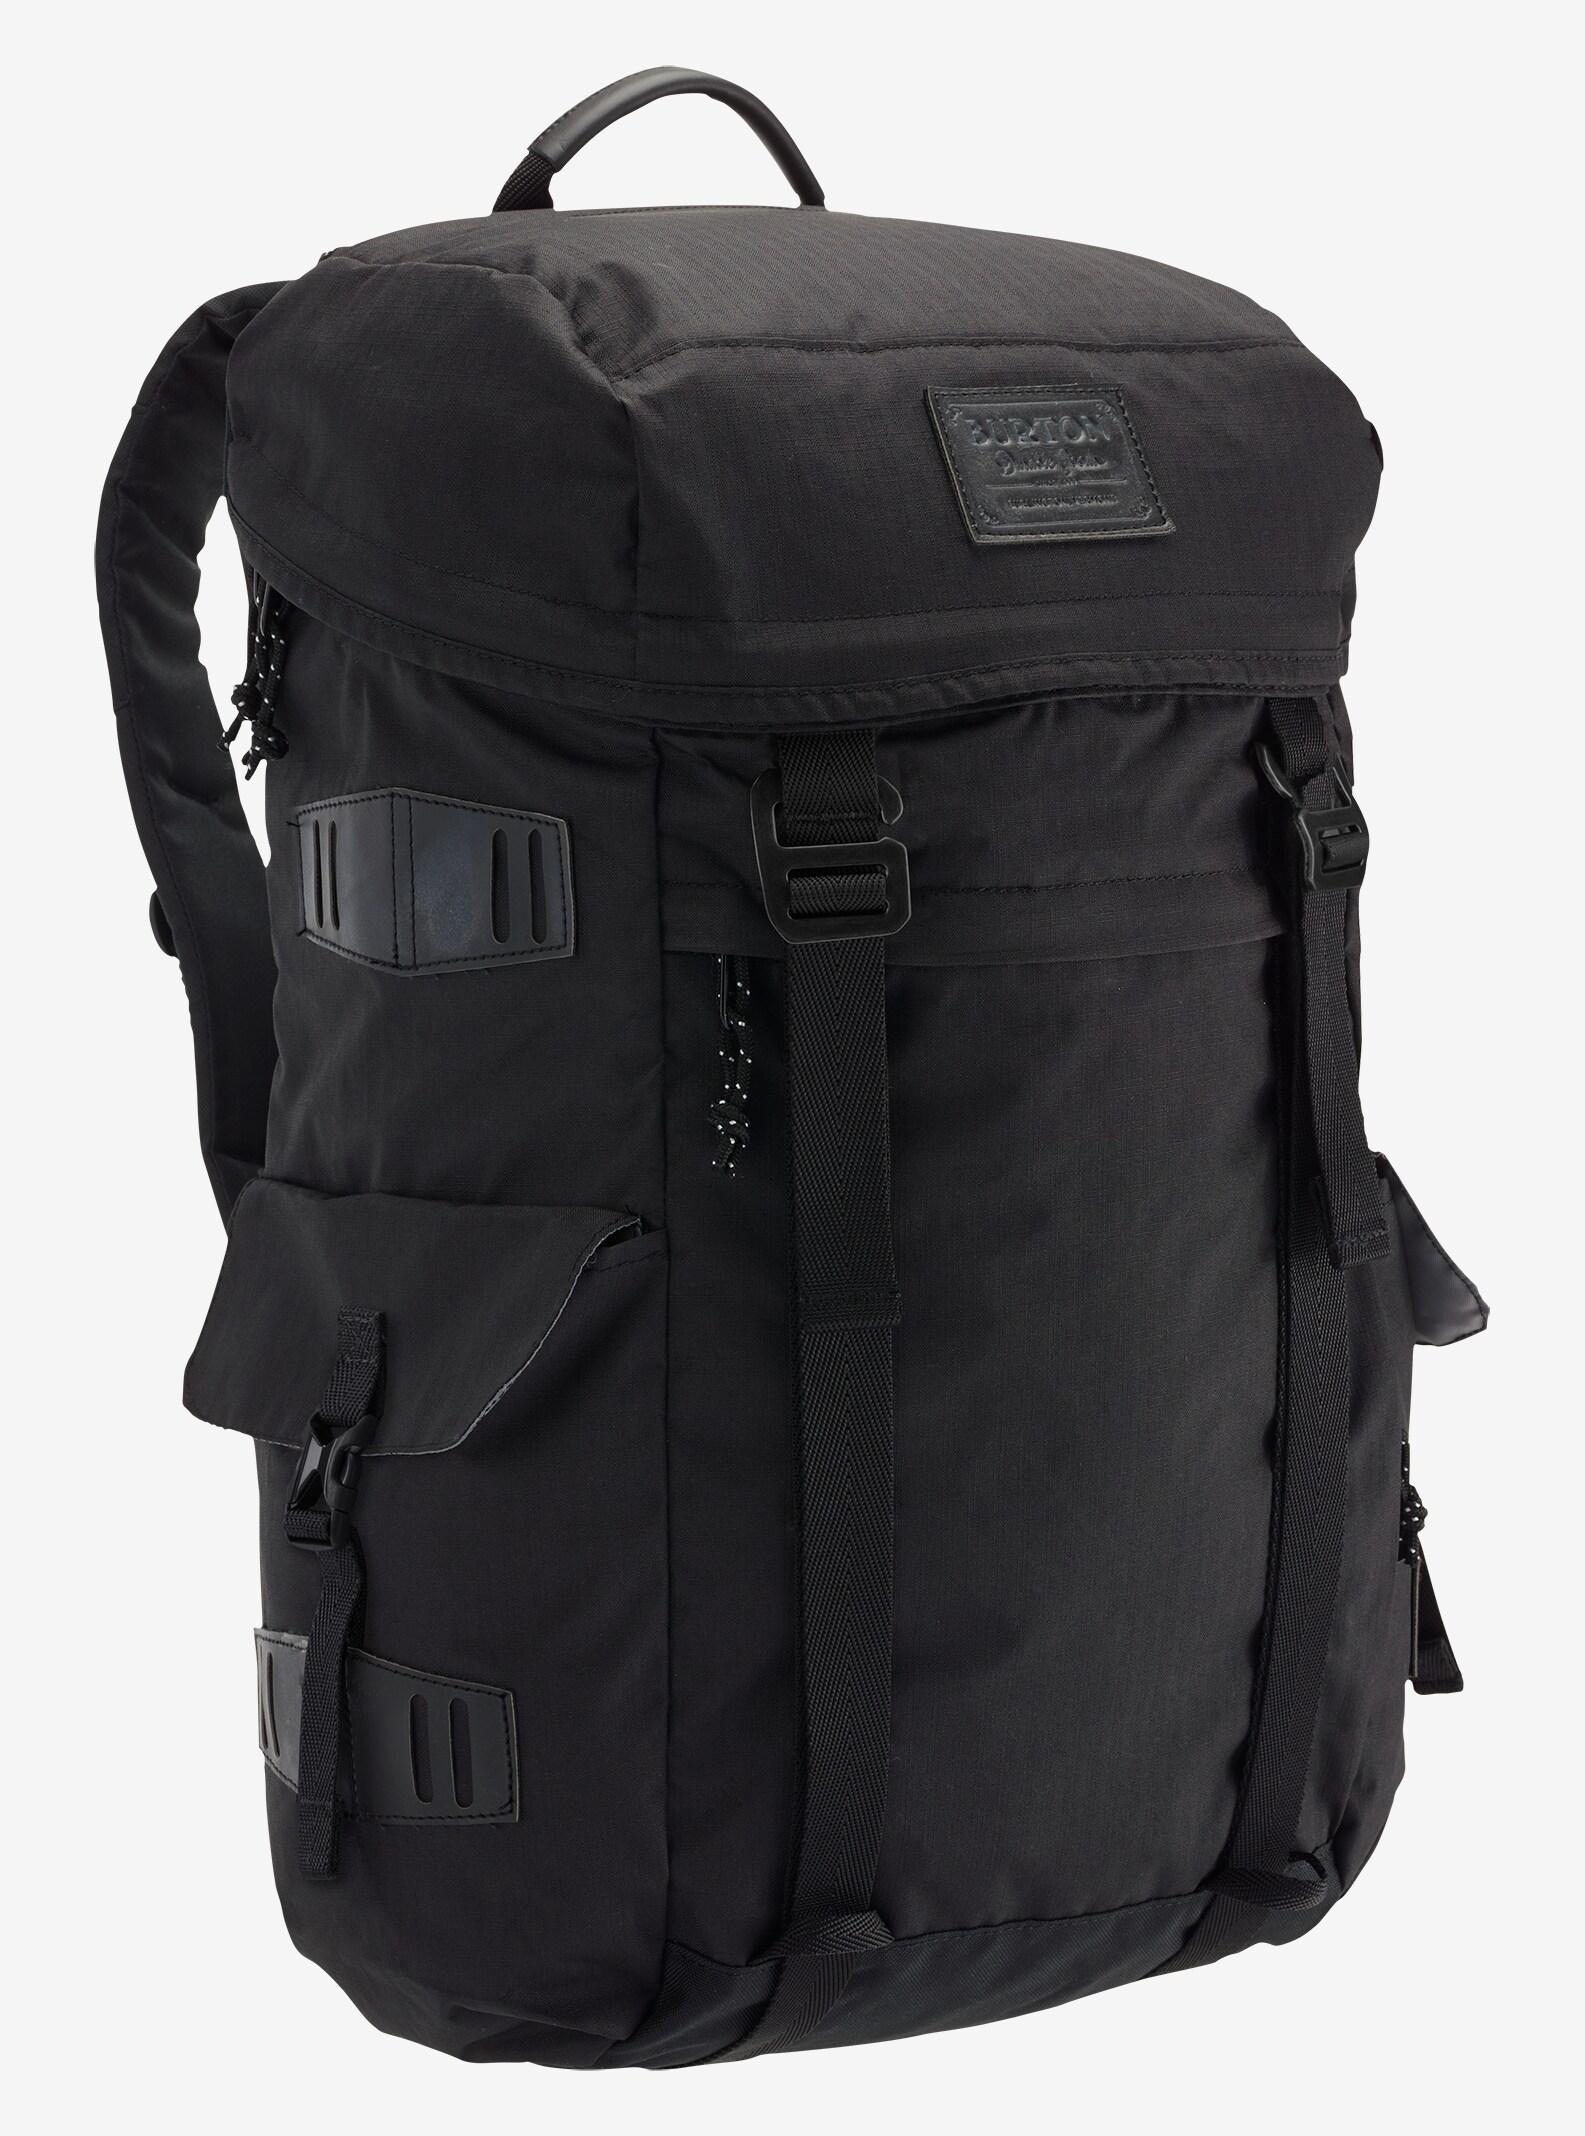 Burton Annex Backpack shown in True Black Triple Ripstop